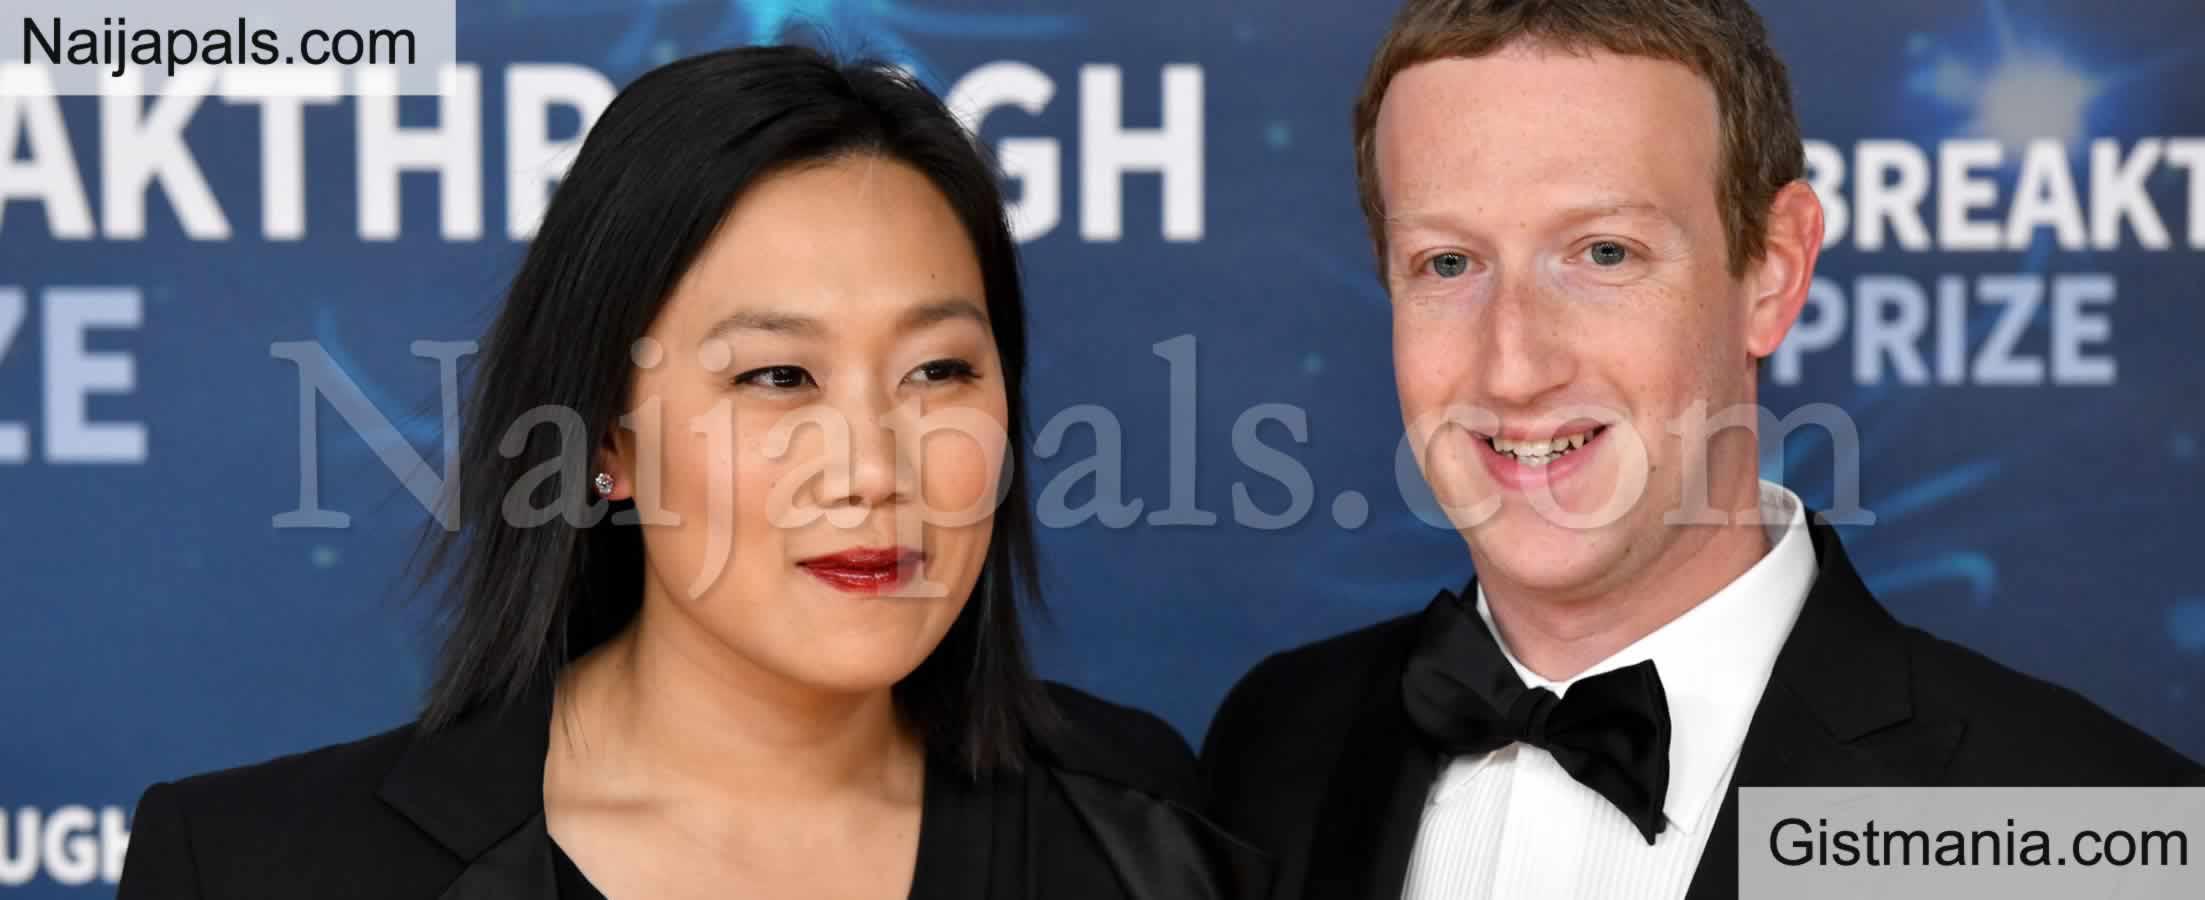 <img alt='.' class='lazyload' data-src='https://img.gistmania.com/emot/comment.gif' /><b> FB Boss, Mark Zuckerberg & Wife, Priscilla Sued By Staff Over Alleged Racist, Homophobic Abuse</b>